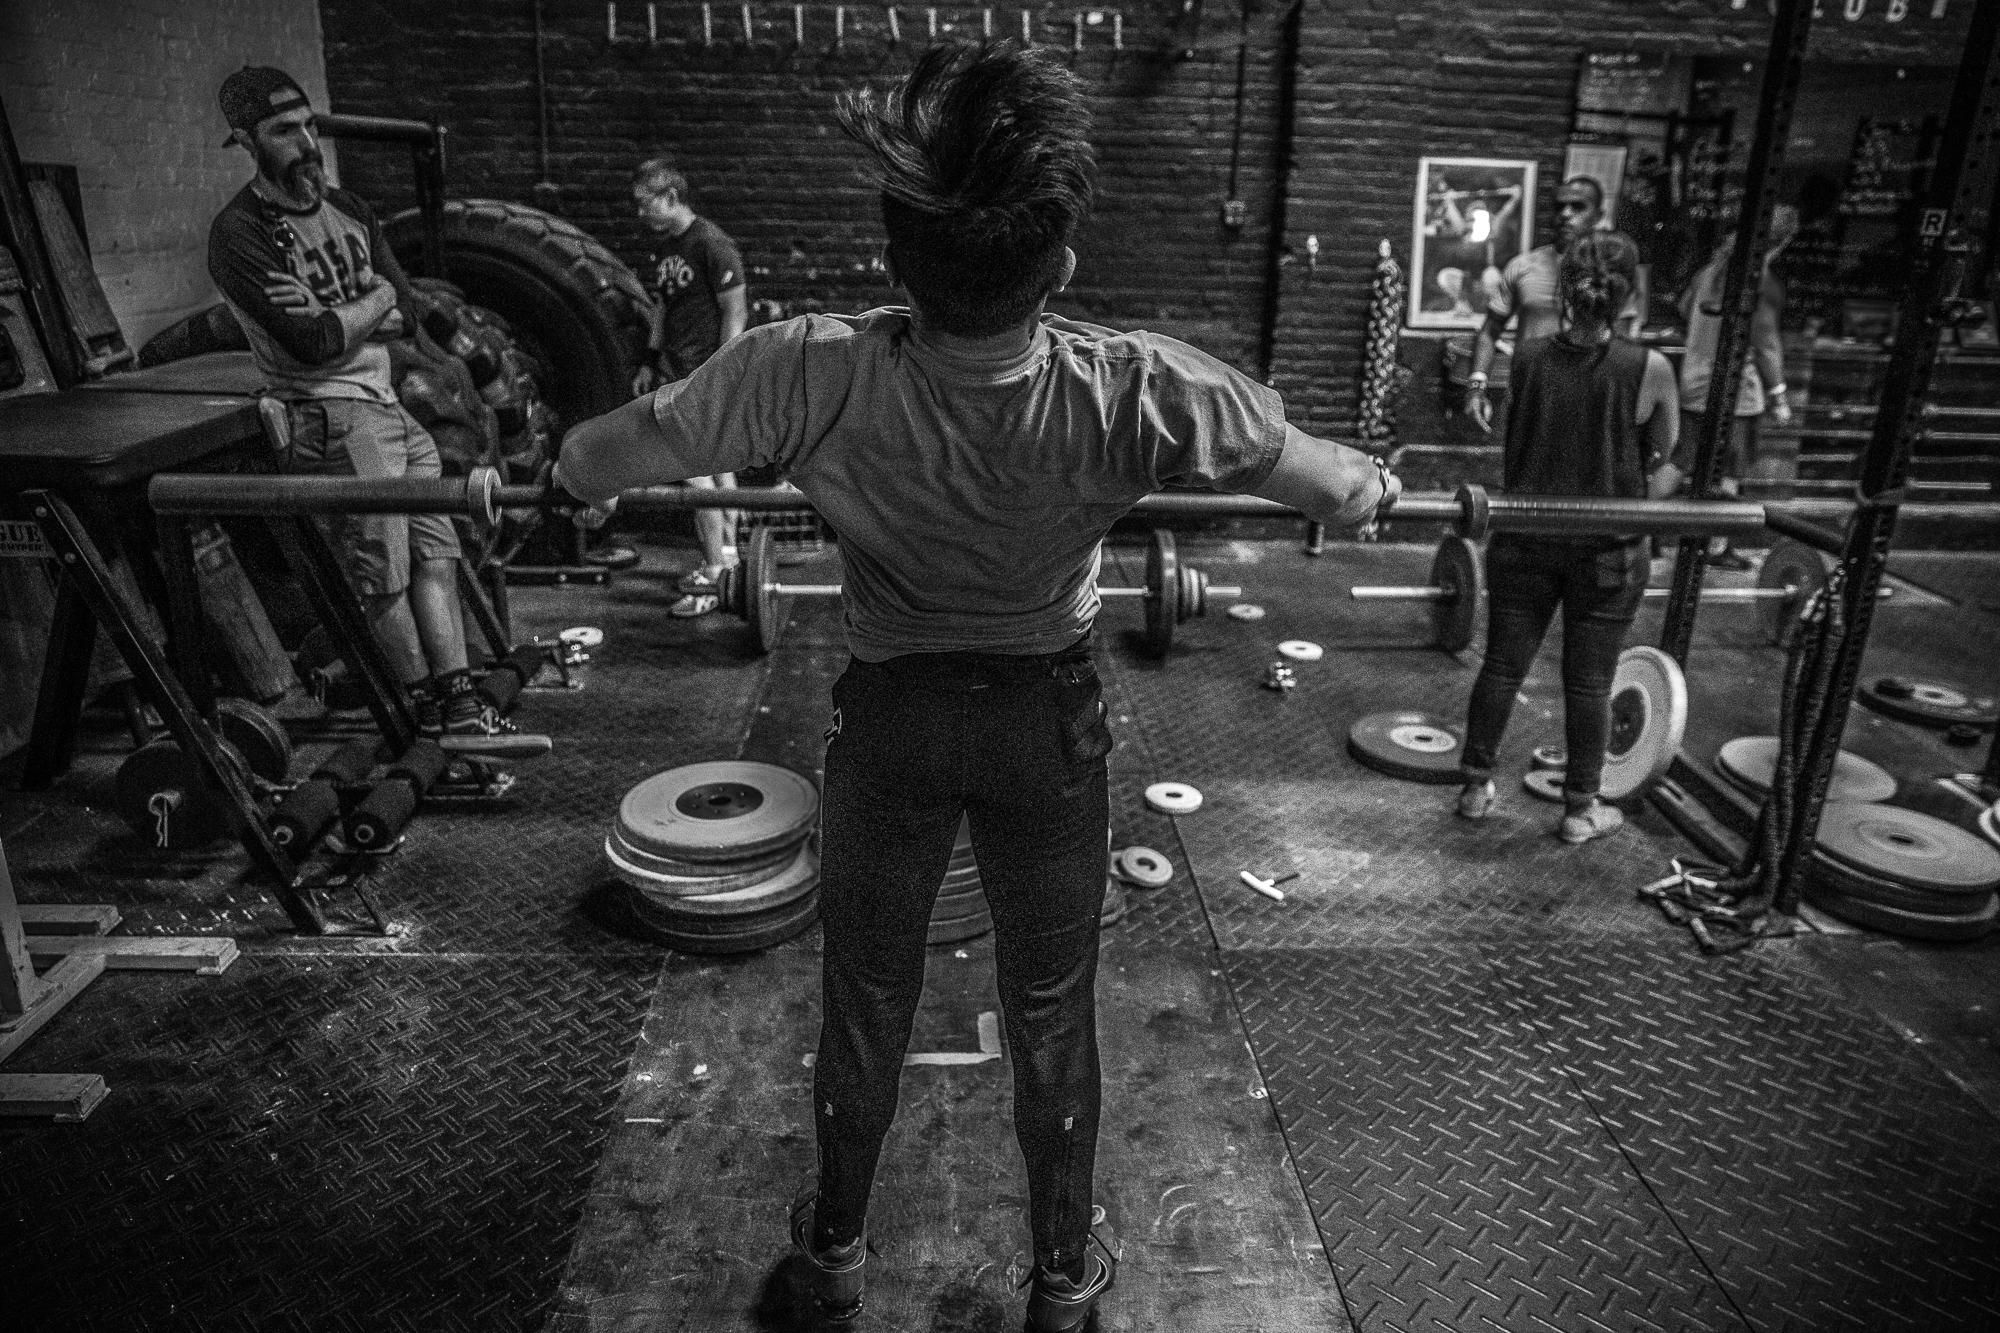 brooklyn-barbell-club-everyday-lifters-25.jpg